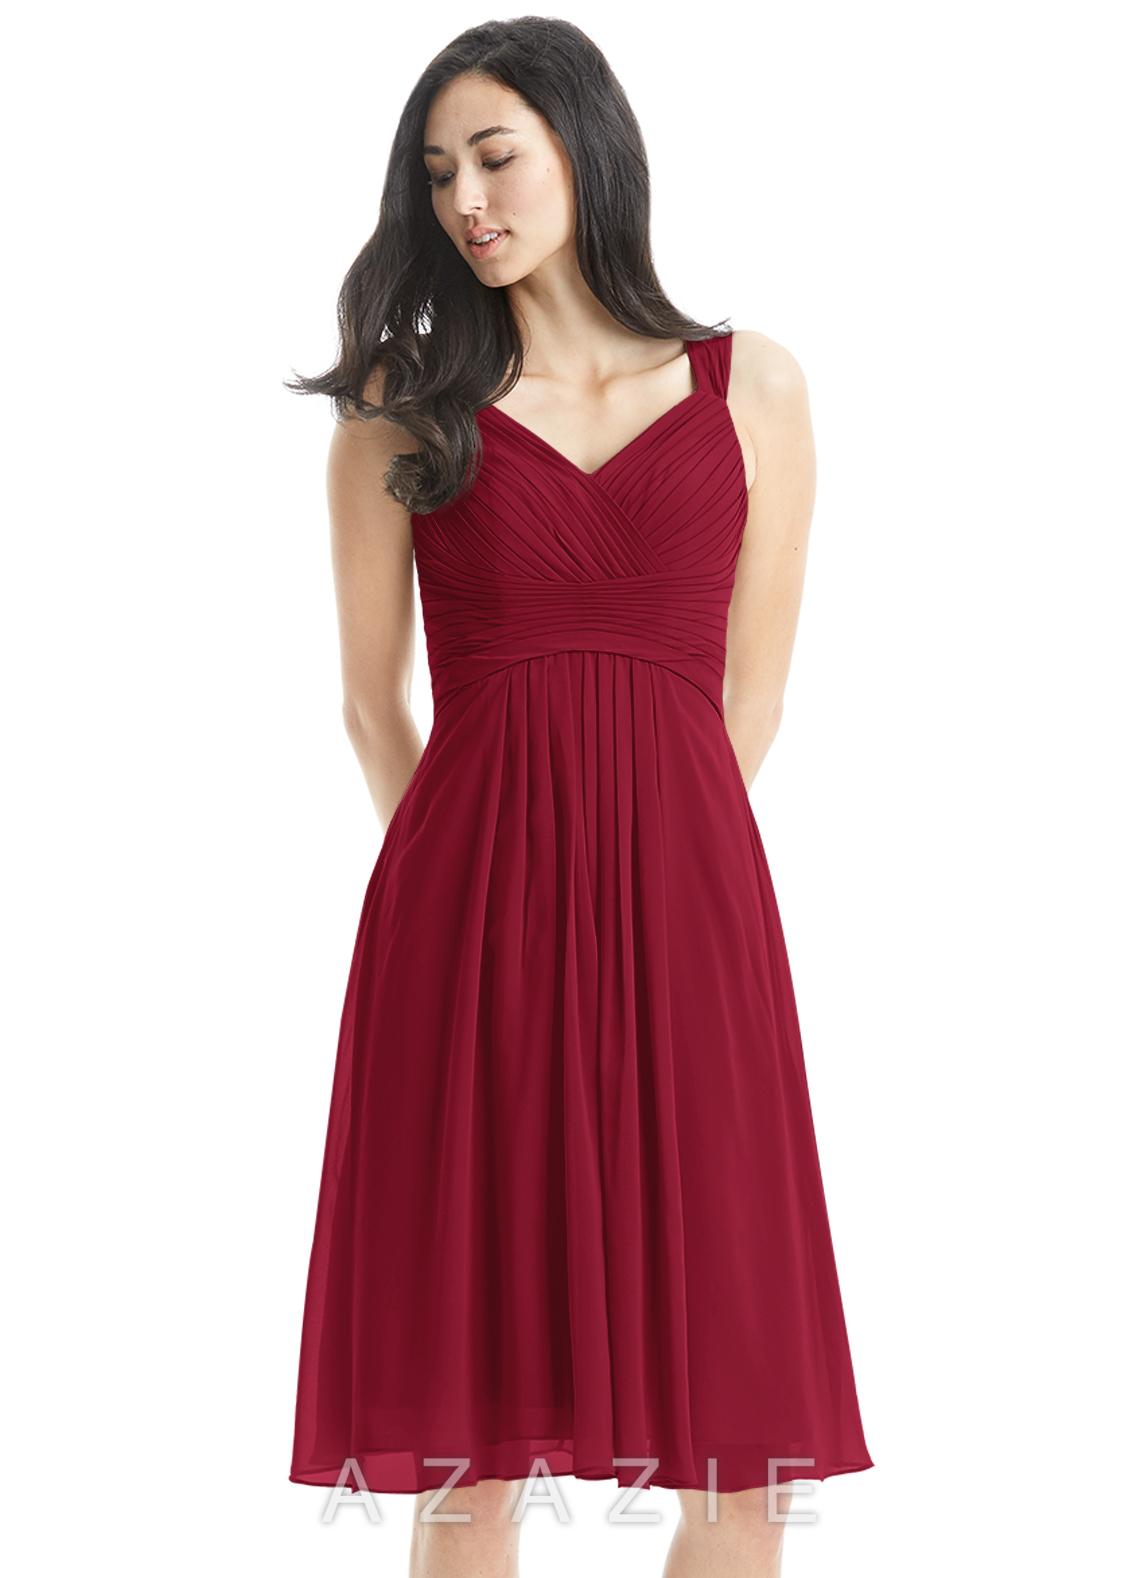 113dd0e680 Azazie Bridesmaid Dresses For Sale - Gomes Weine AG